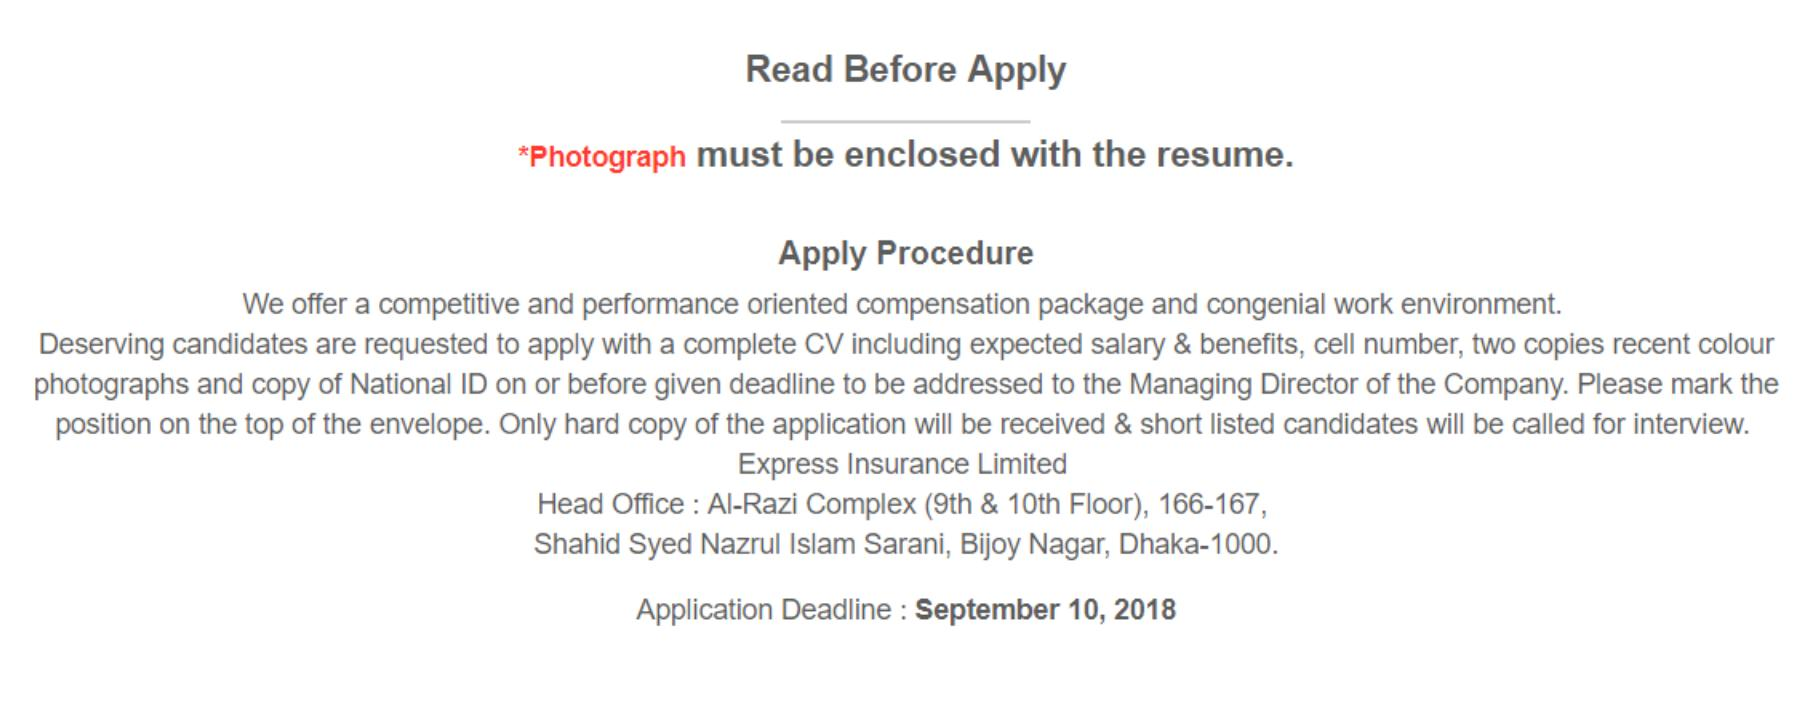 Express Insurance Limited Job Circular